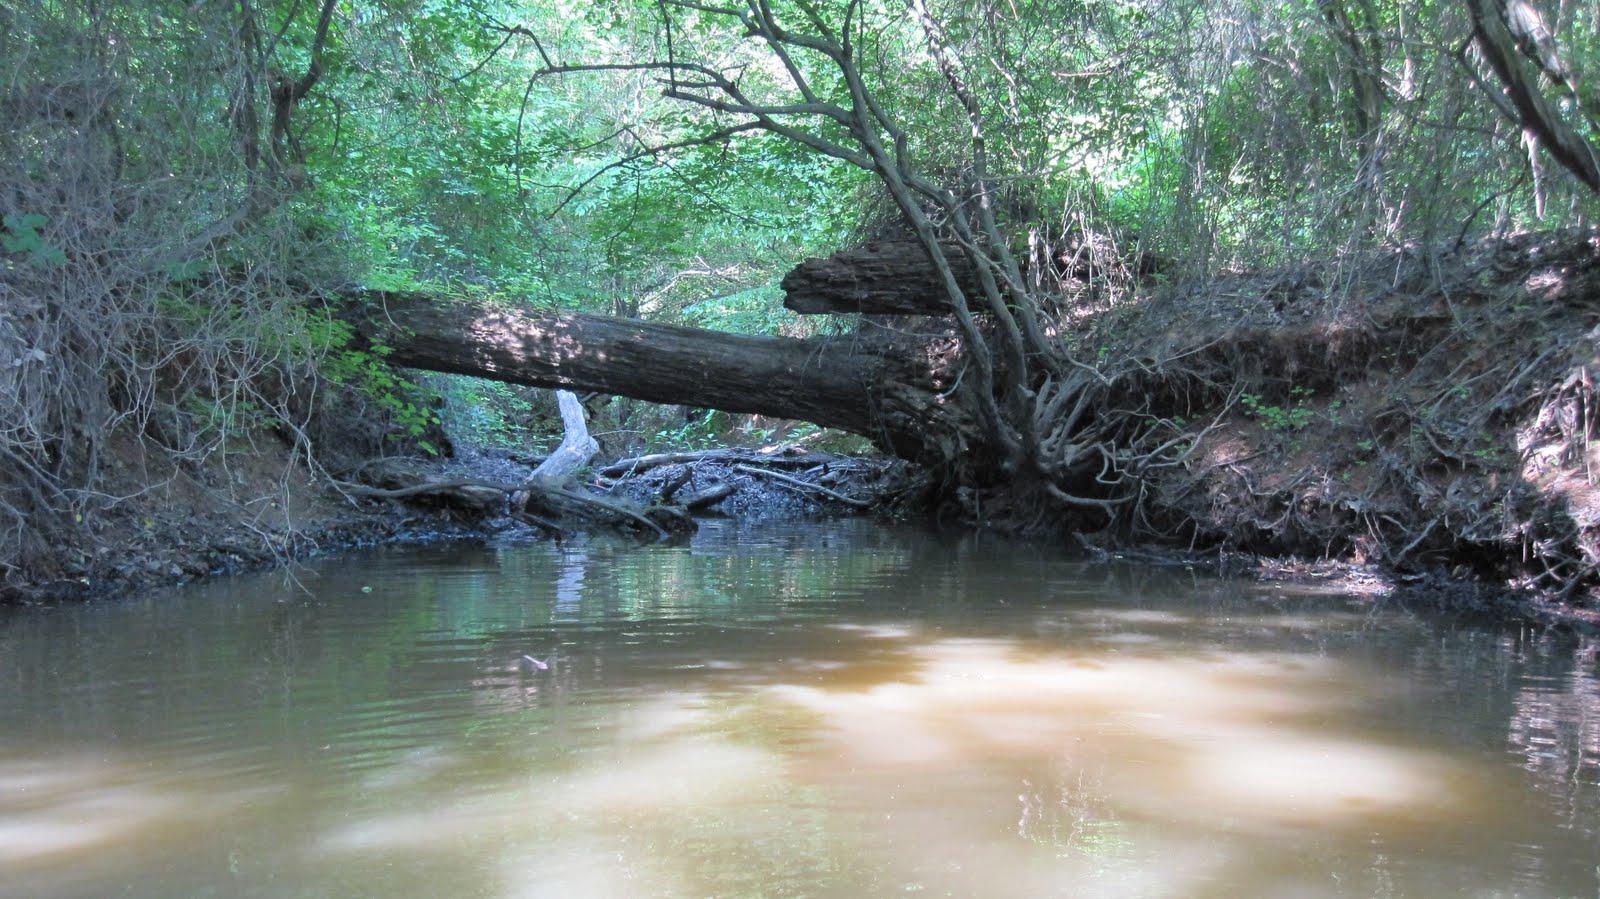 Durhamblogger  A Great Morning Paddling the Eno River